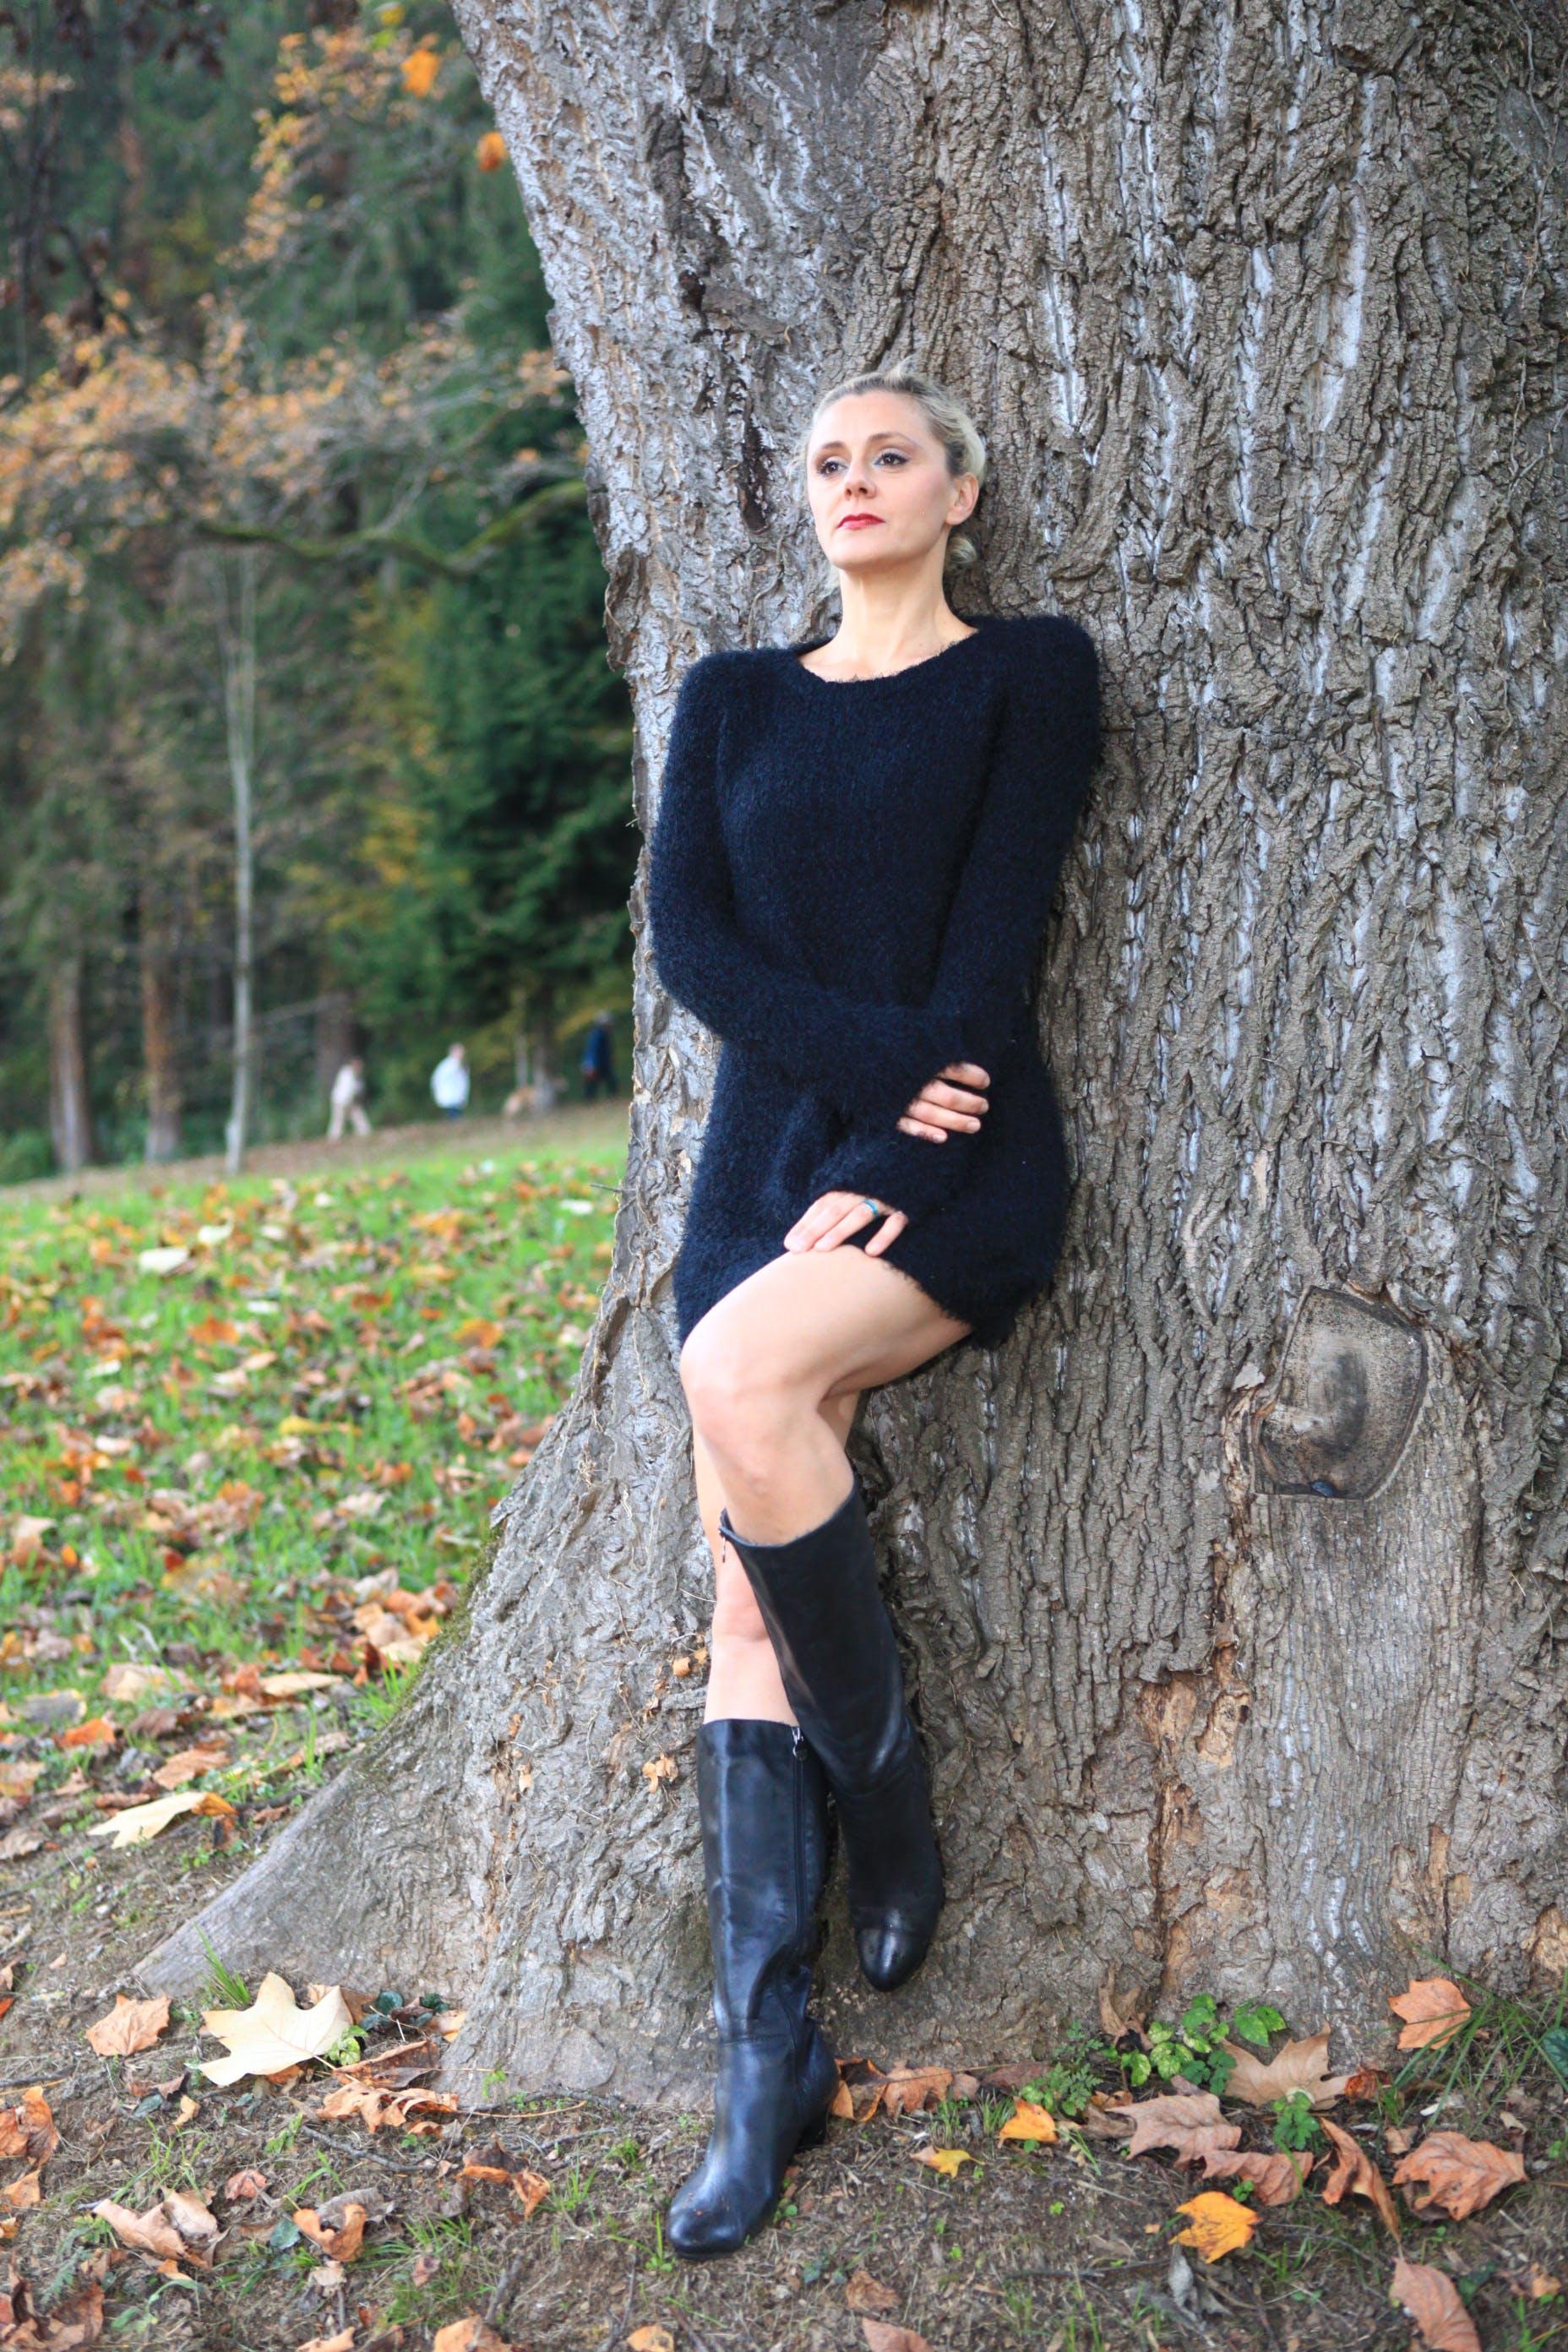 Free stock photo of autumn, bare legs, black dress, blackboots